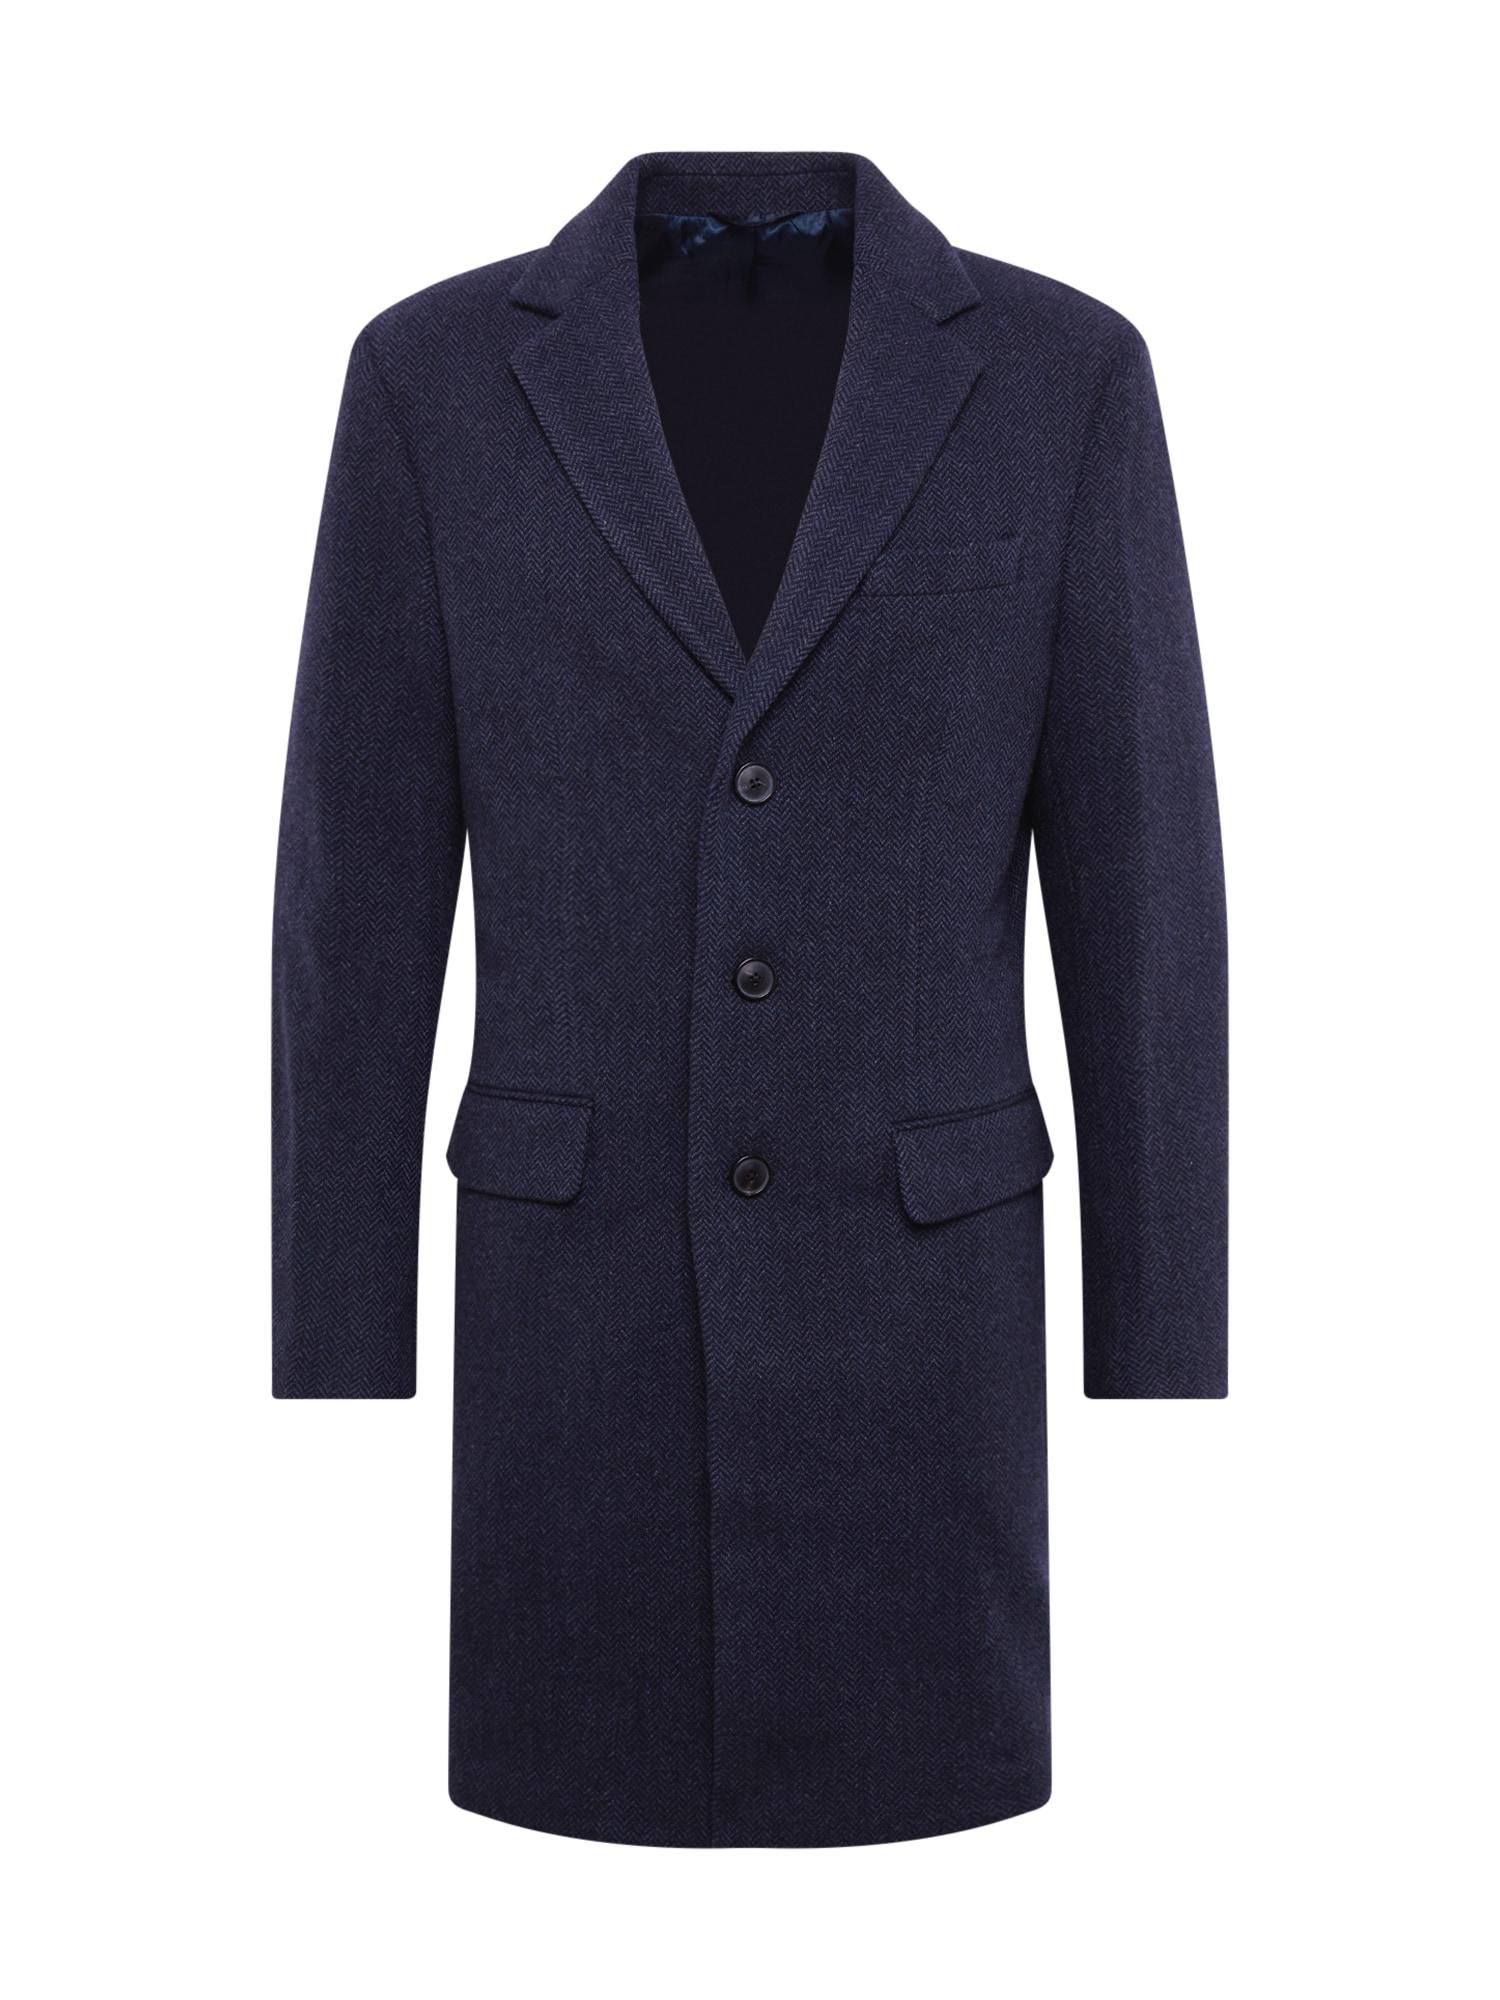 Banana Republic Rudeninis-žieminis paltas 'WOOL BLEND TOPCOAT' tamsiai mėlyna